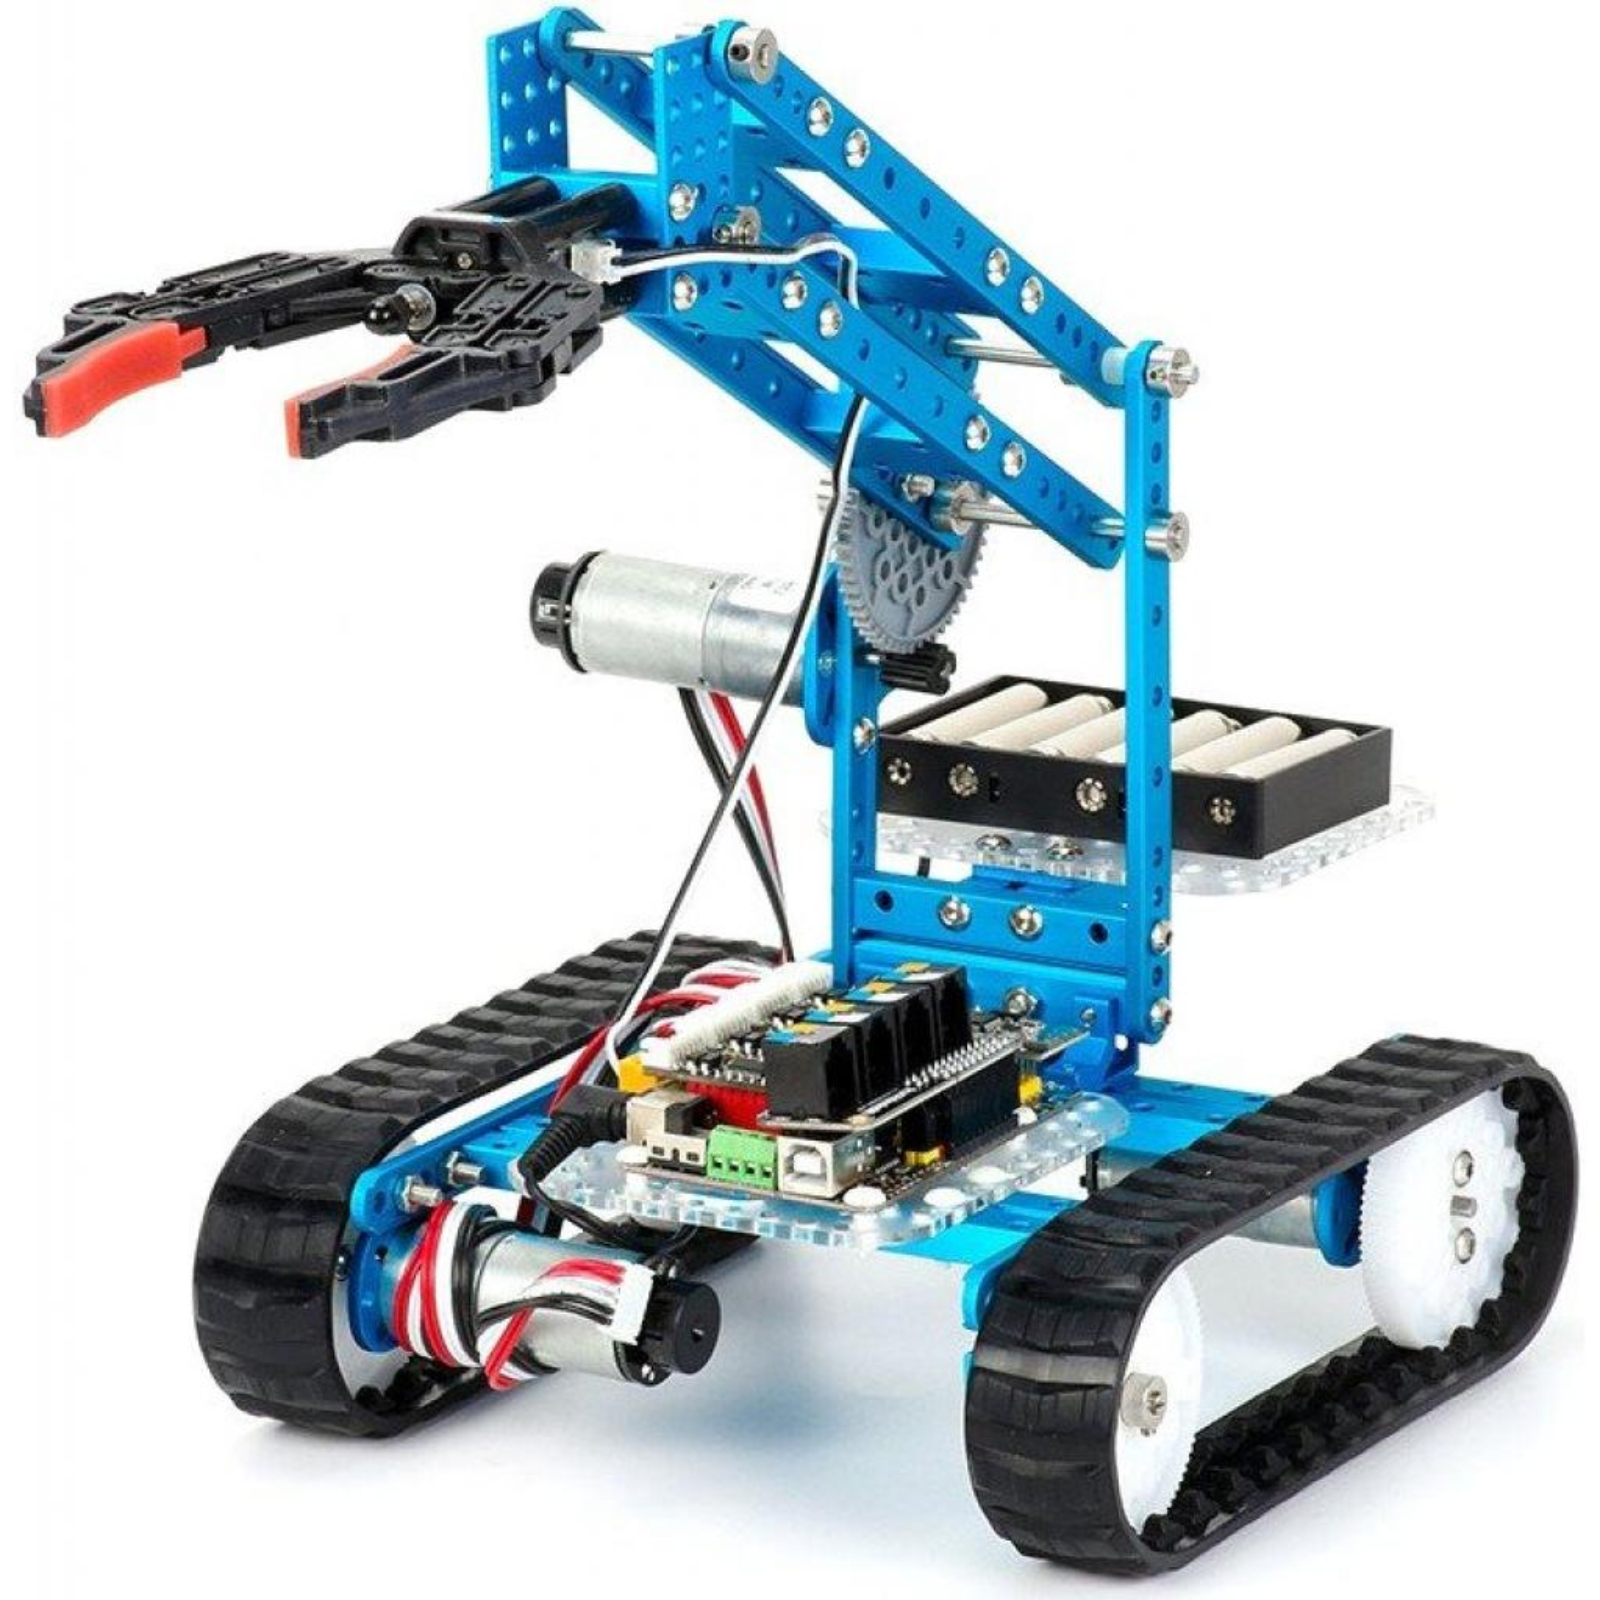 Робот Makeblock Ultimate v2.0 Robot Kit (09.00.40) изображение 5